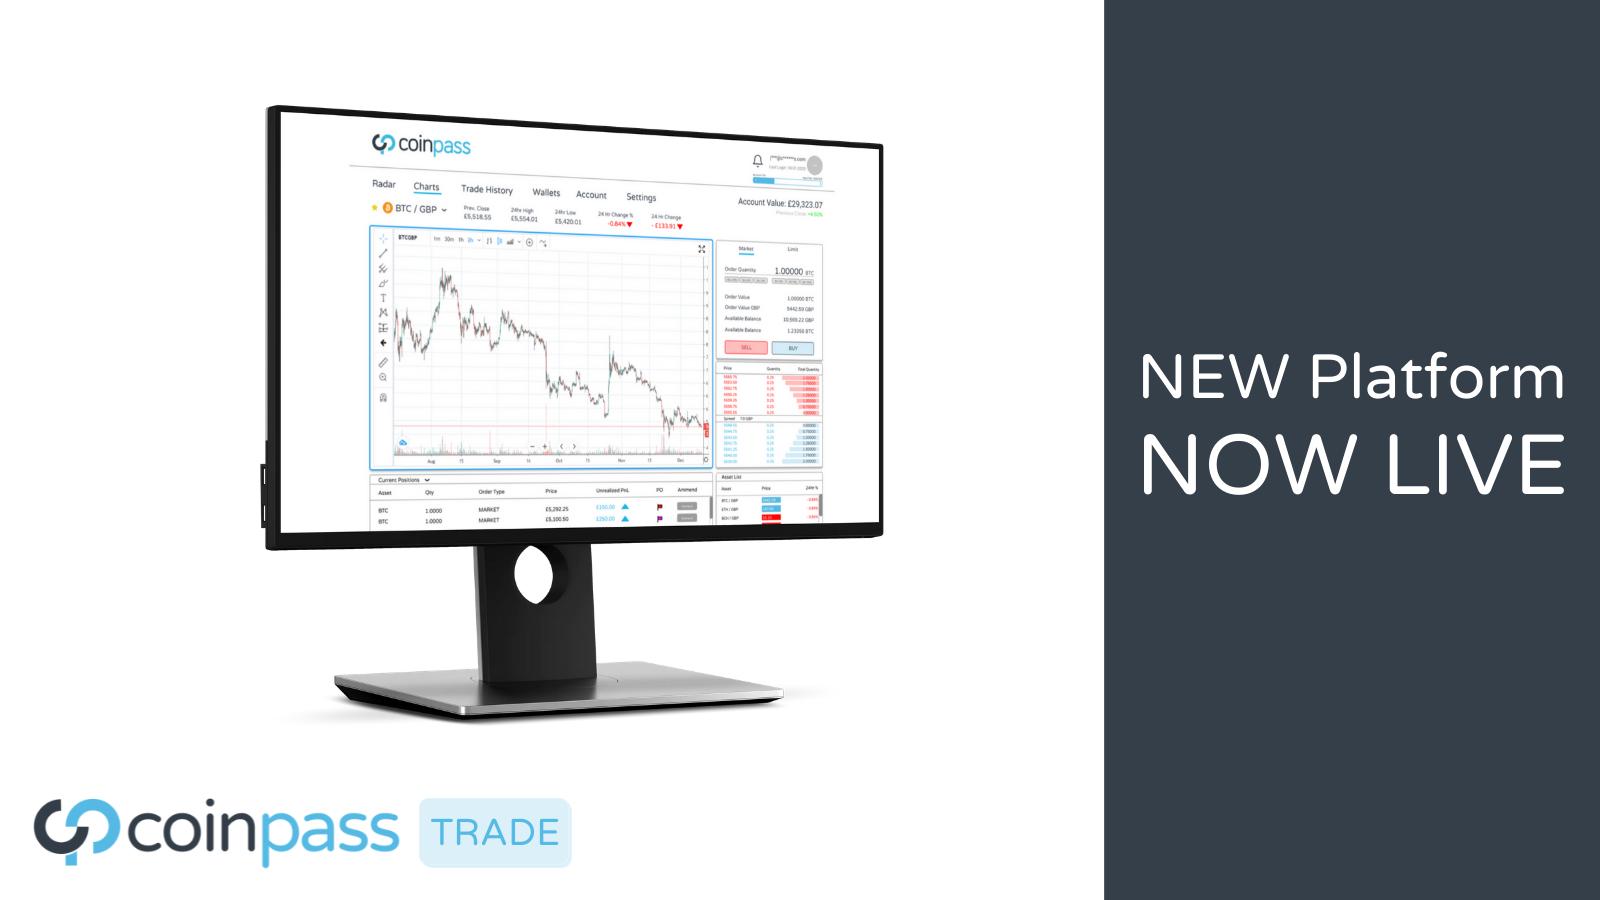 coinpass Launch Innovative Crypto Trading Platform